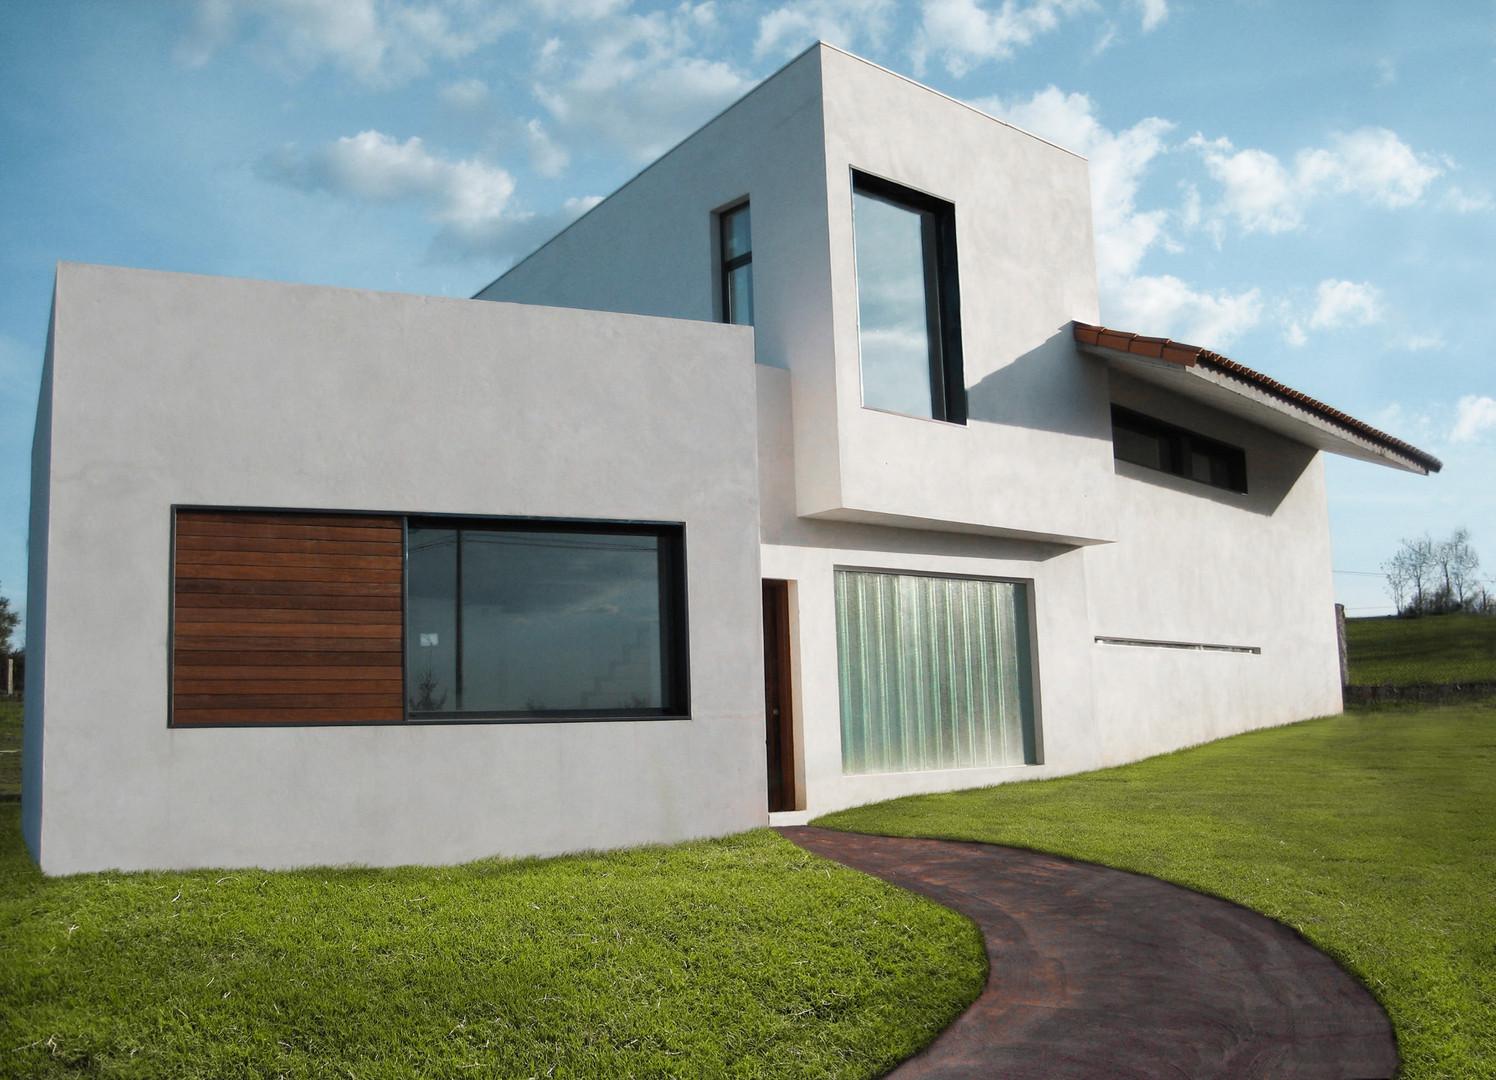 arquitectura-senmais-06.24.01.jpg